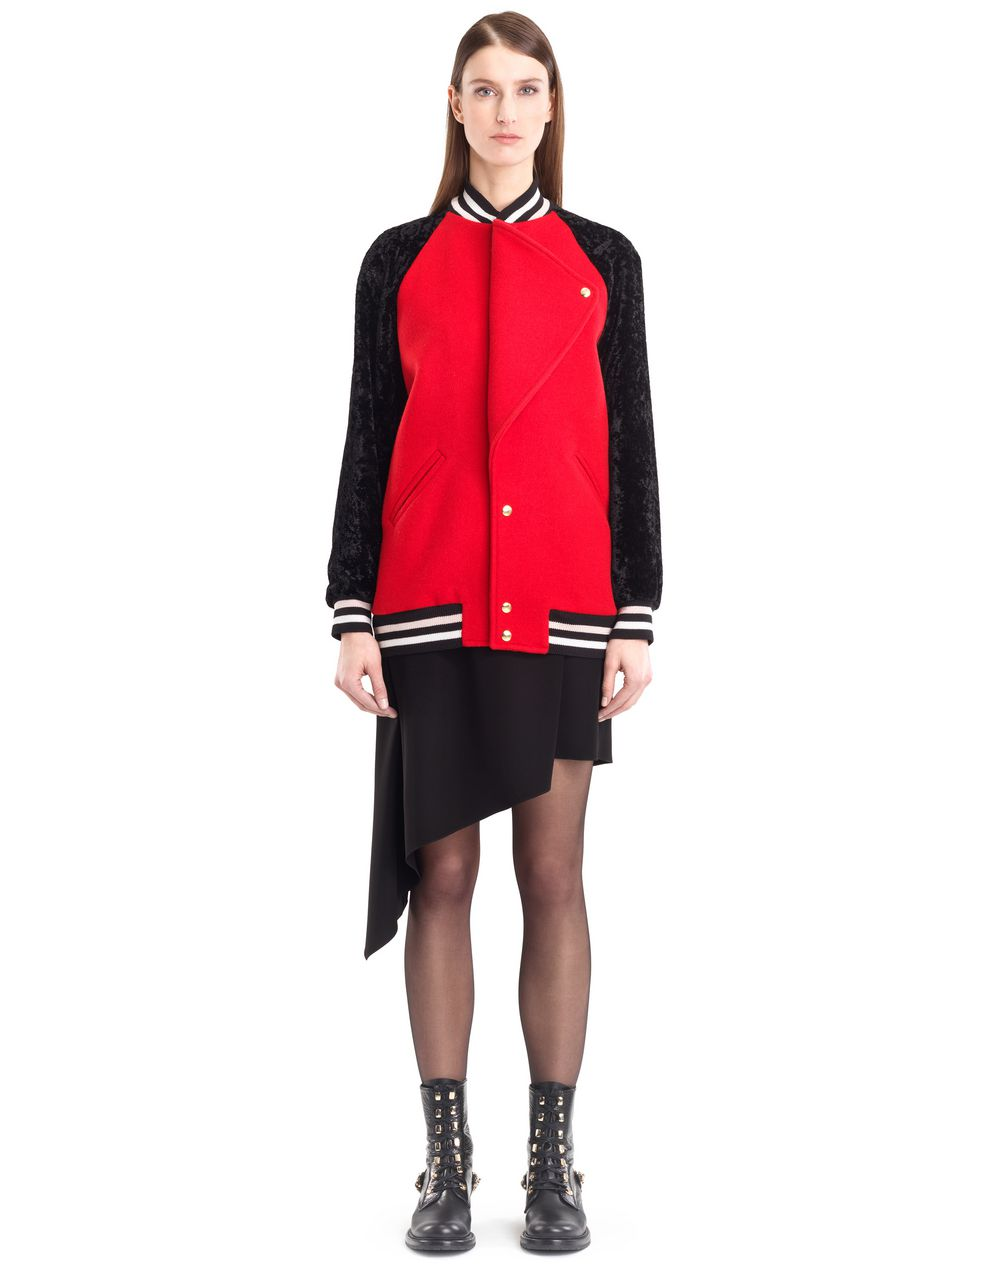 WOOL CLOTH TEDDY JACKET - Lanvin